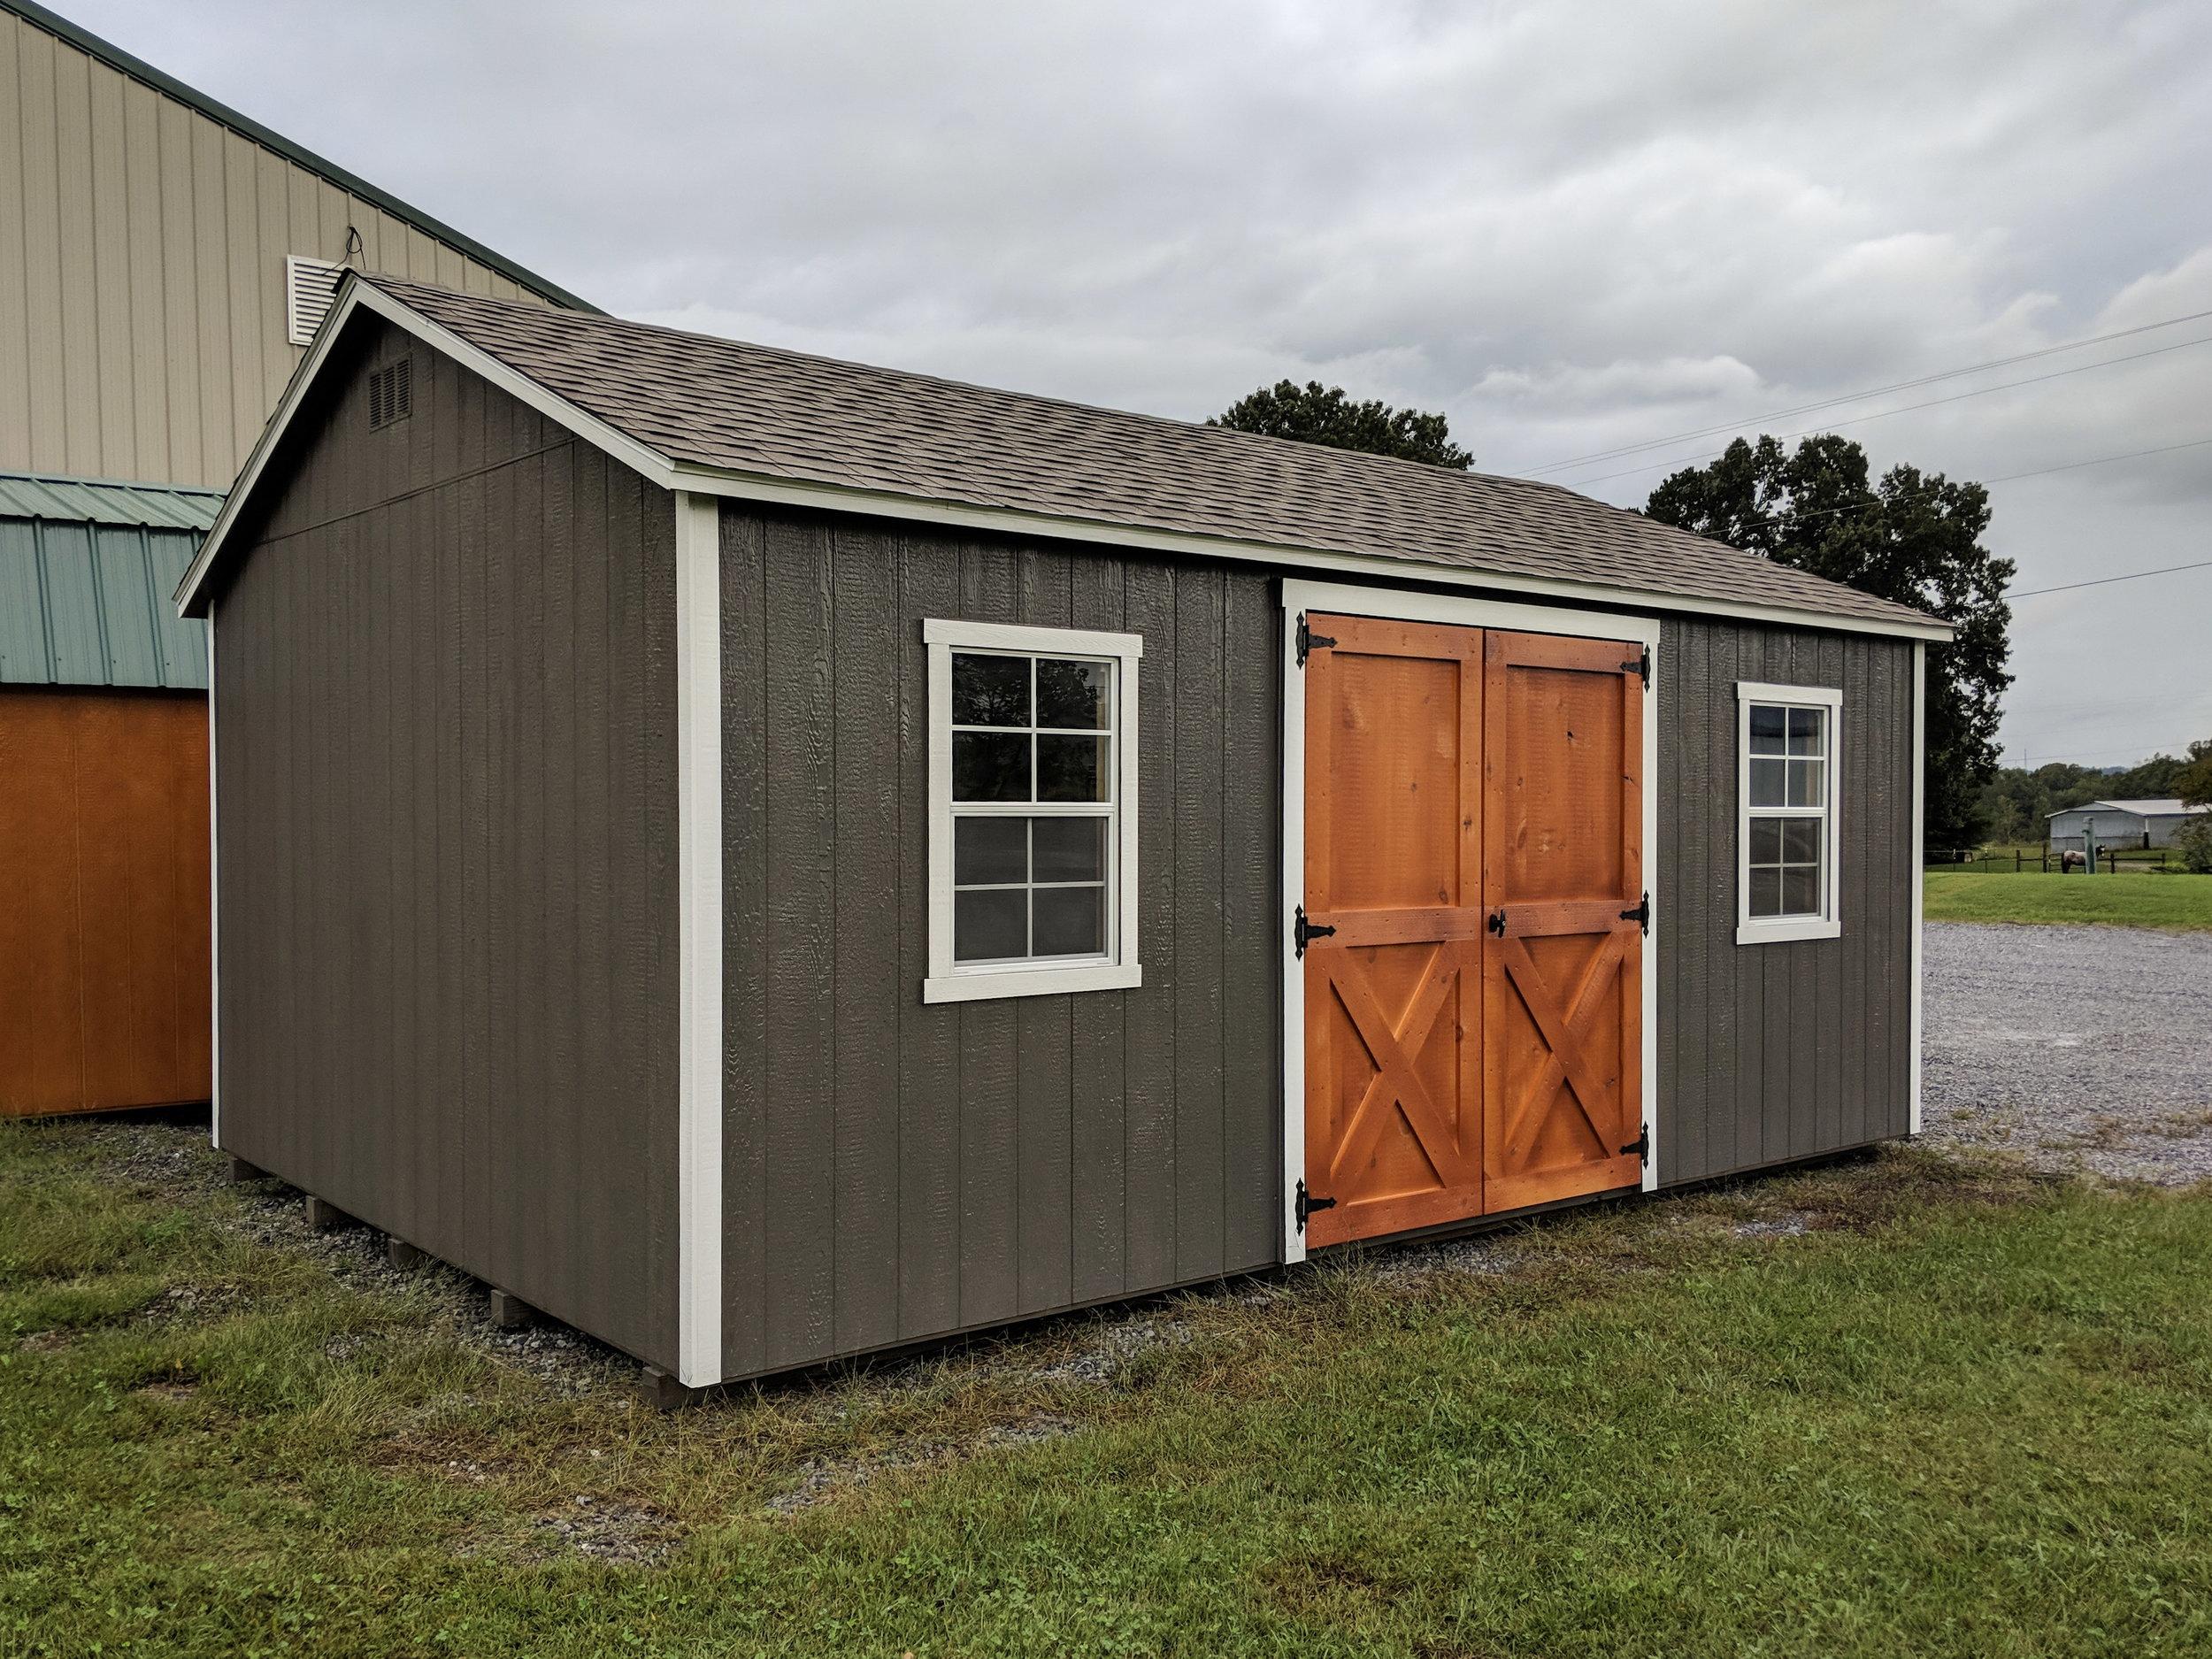 14' x 20' Cottage